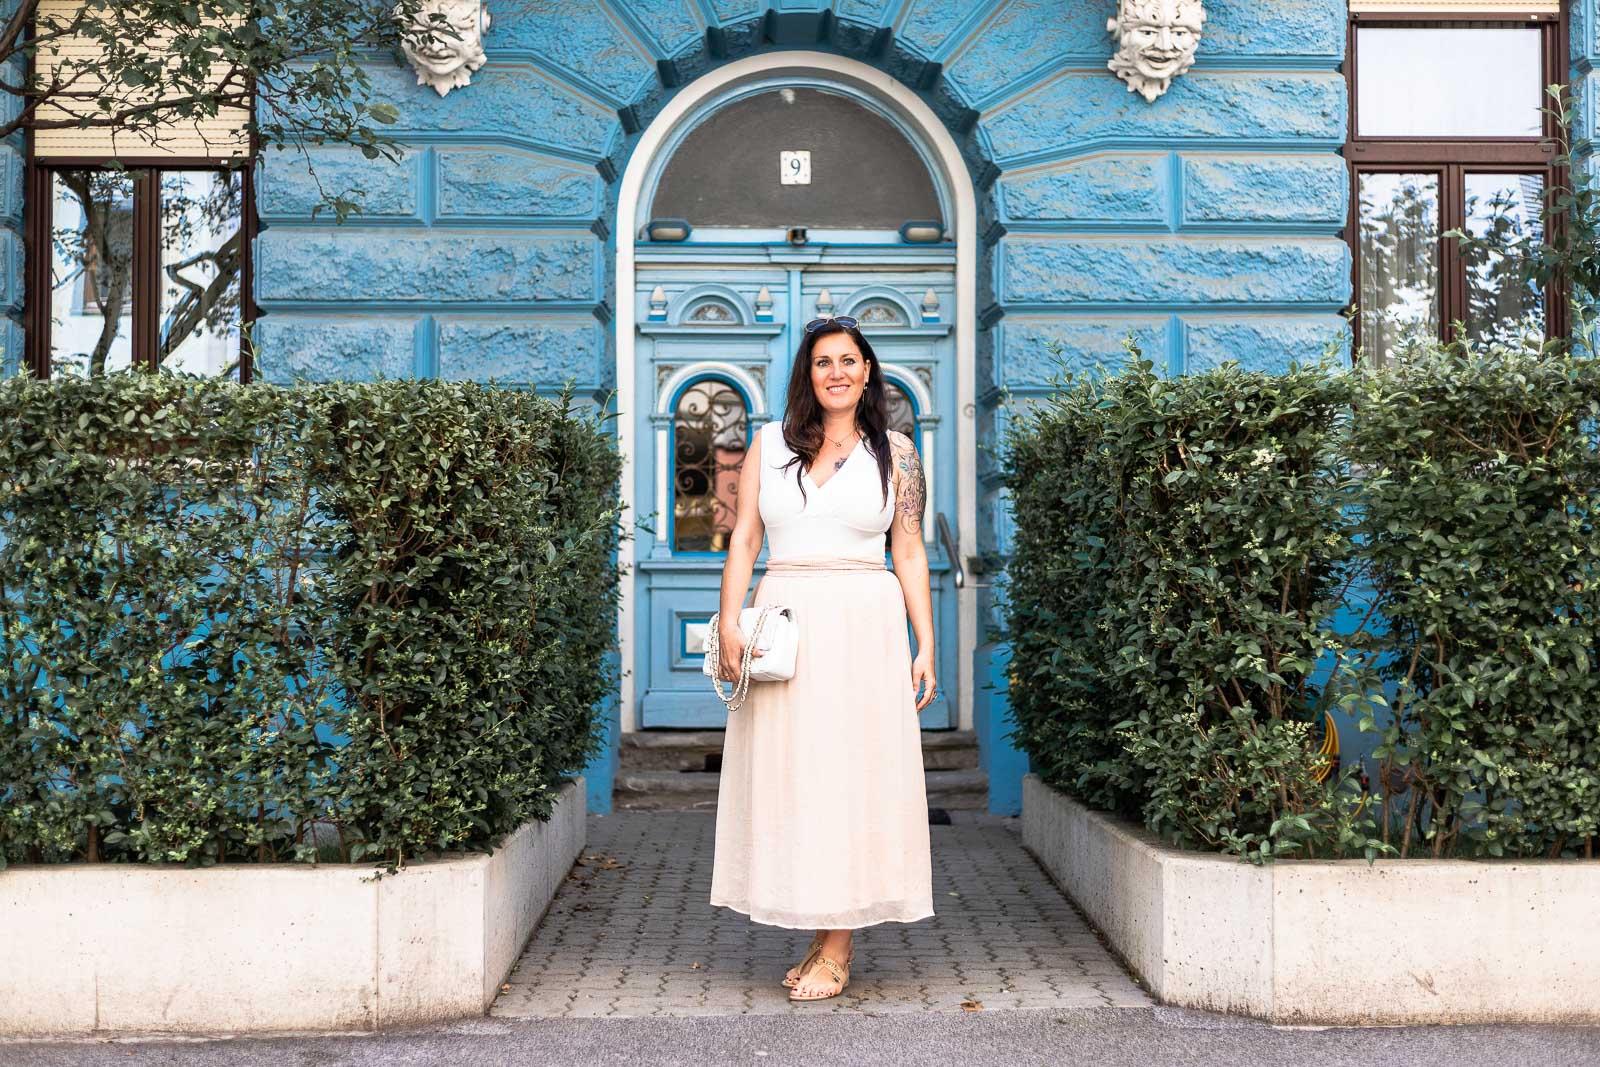 online store f6239 ebf28 Sommer-Outfit mit rosa Maxirock und weißem Body - Miss Classy